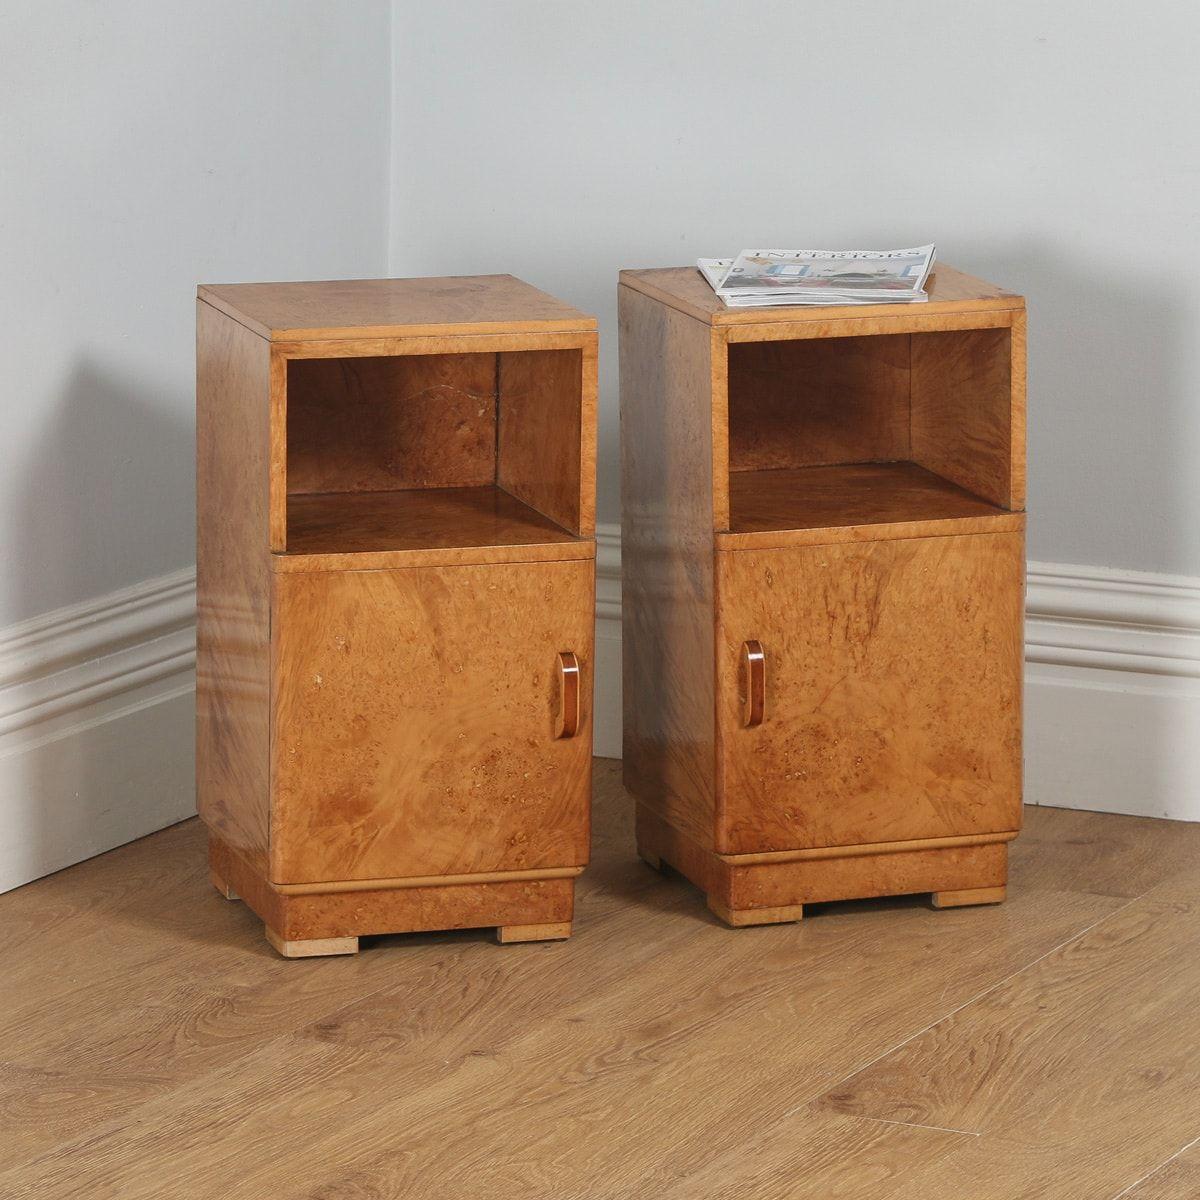 Antique Pair Of English Art Deco Birds Eye Maple Bedside Cabinets Circa 1930